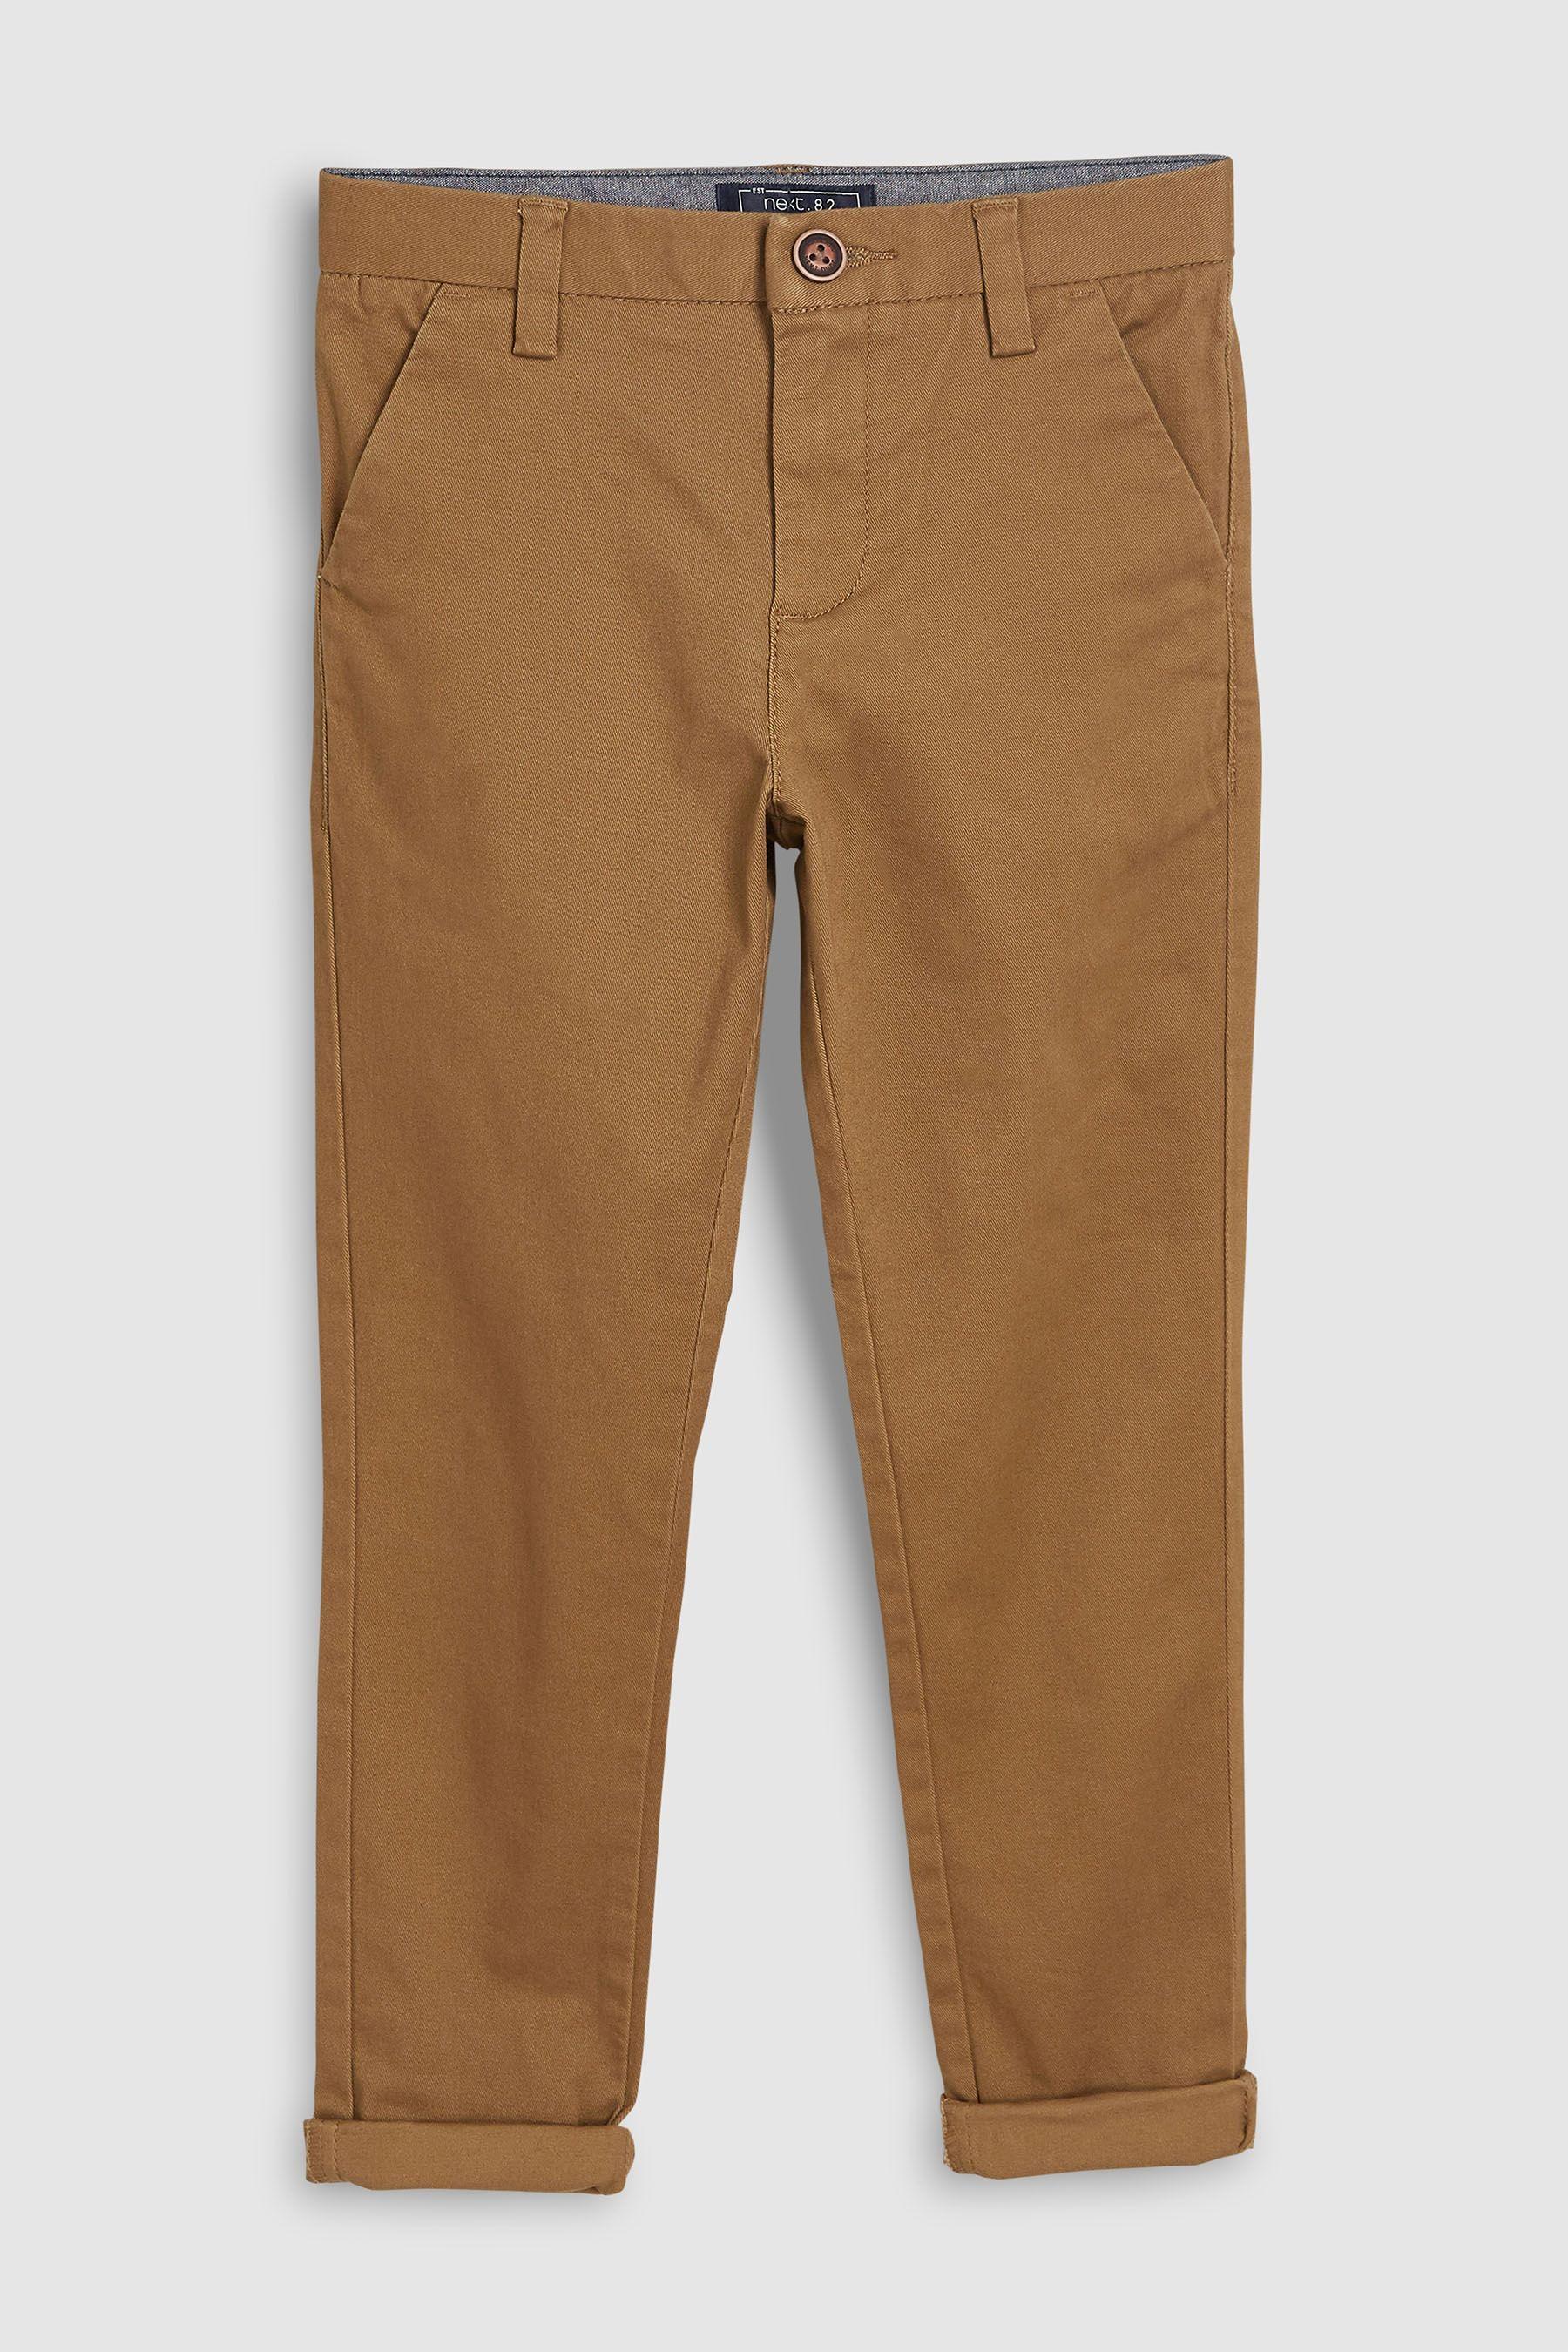 f496a66b85 Boys Next Navy Skinny Chino Trousers (3-16yrs) - Blue in 2019 ...